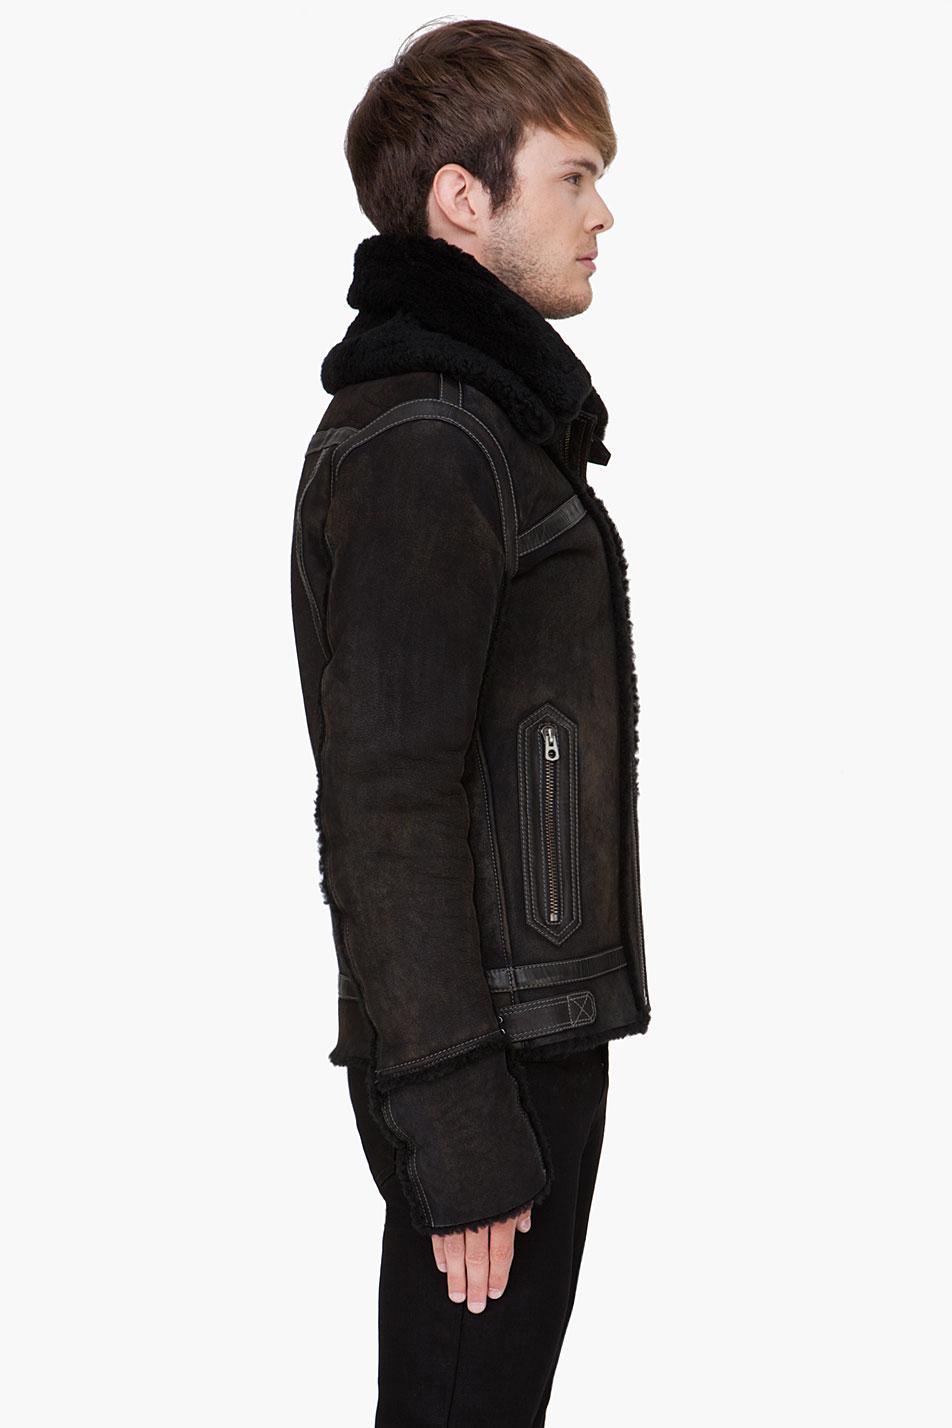 Diesel Black Shearling Lencang Jacket in Black for Men | Lyst